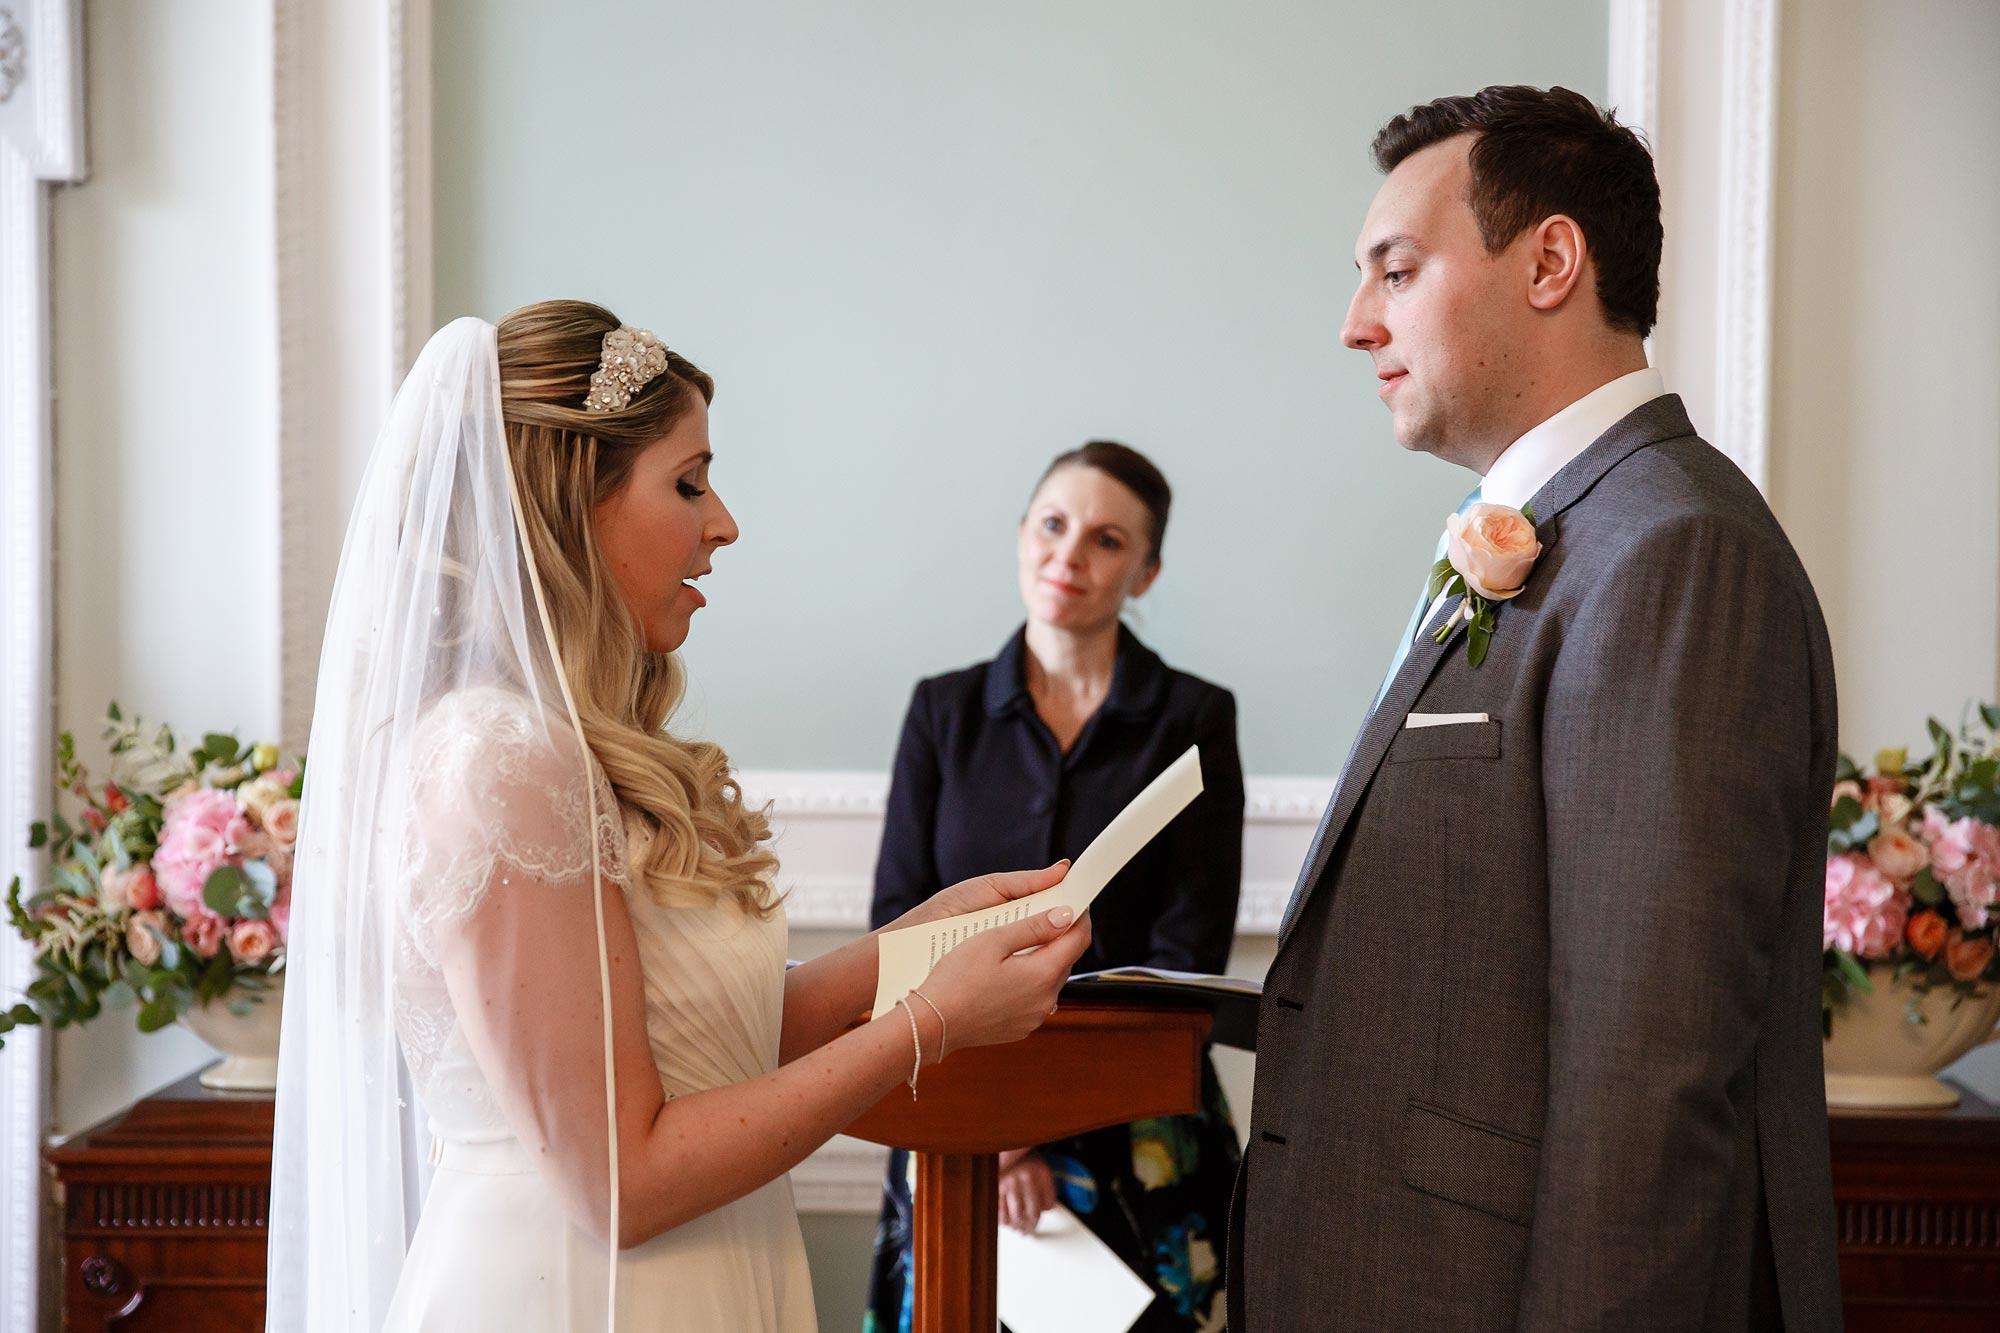 vows at botleys mansion